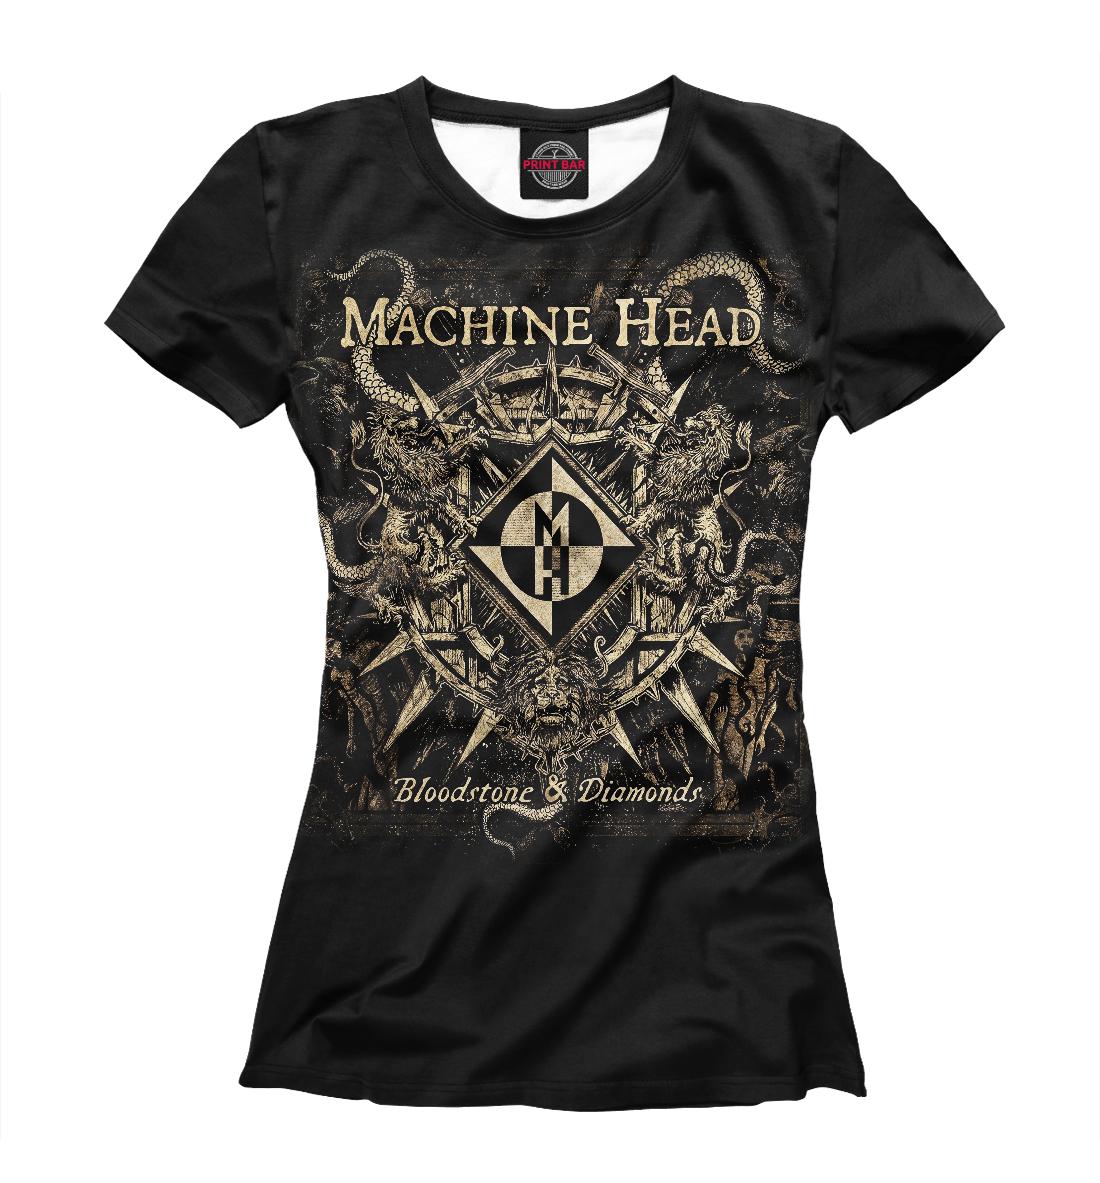 Купить Machine Head, Printbar, Футболки, MZK-477891-fut-1